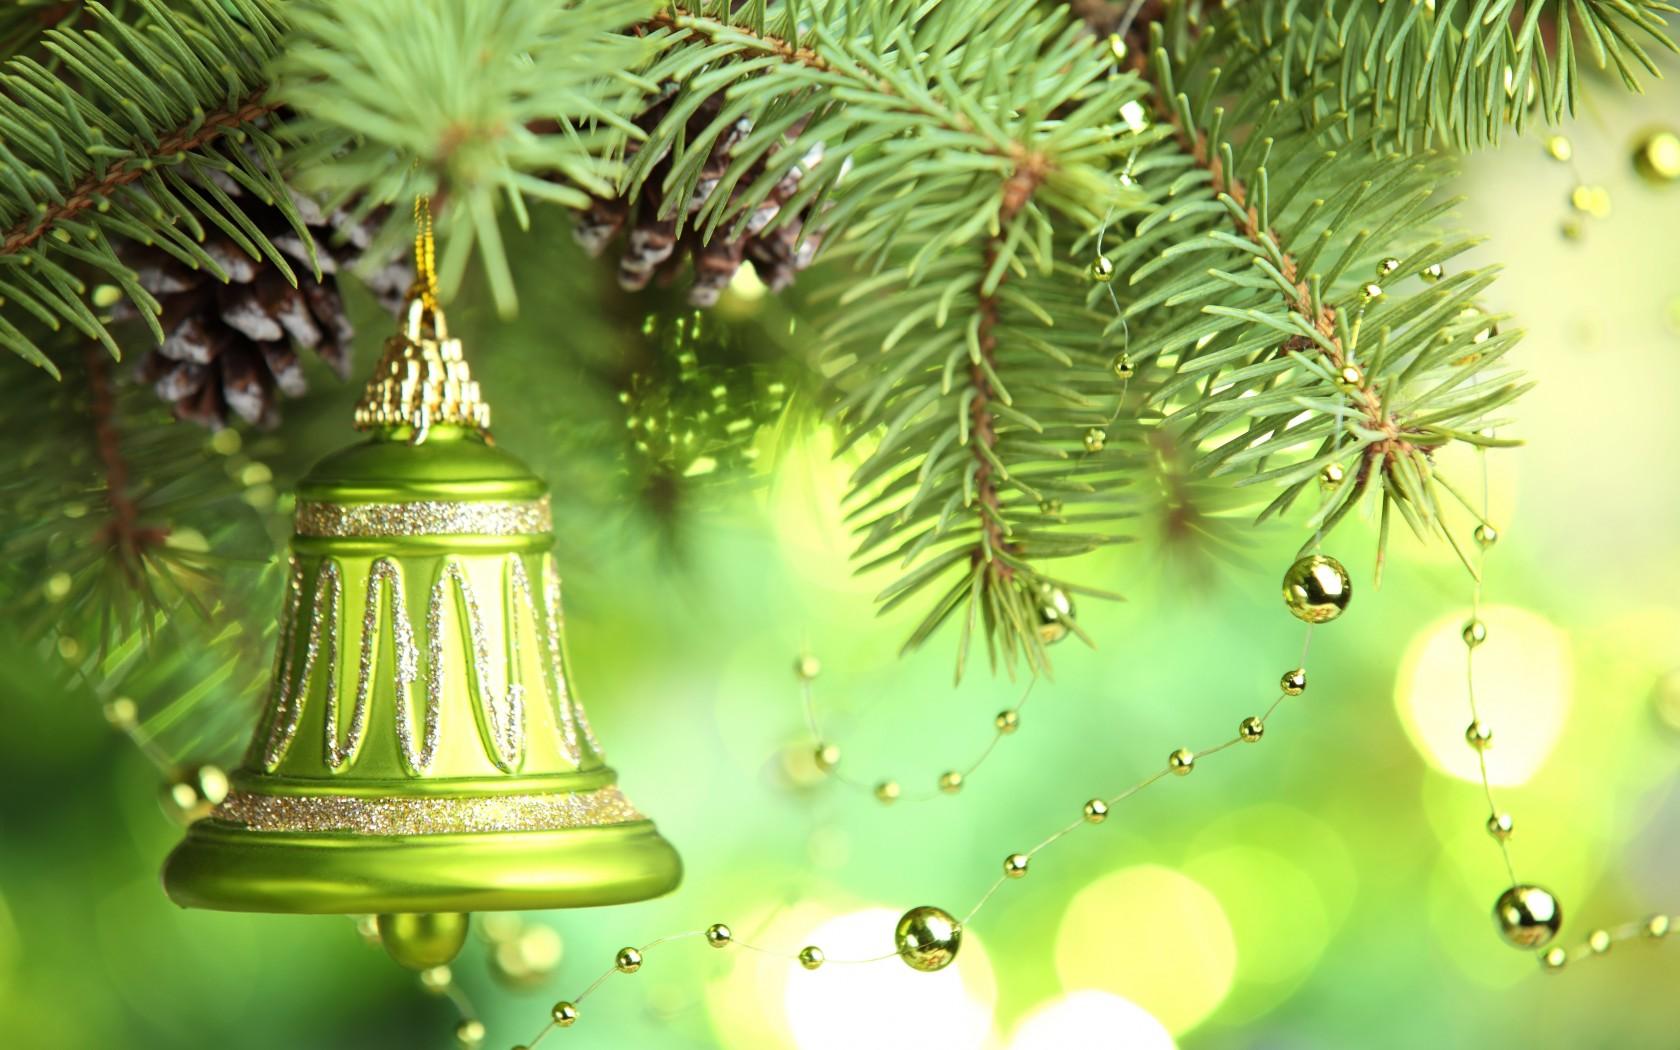 Christmas Green.Merry Christmas Green Bells Wallpapers 1680x1050 335188